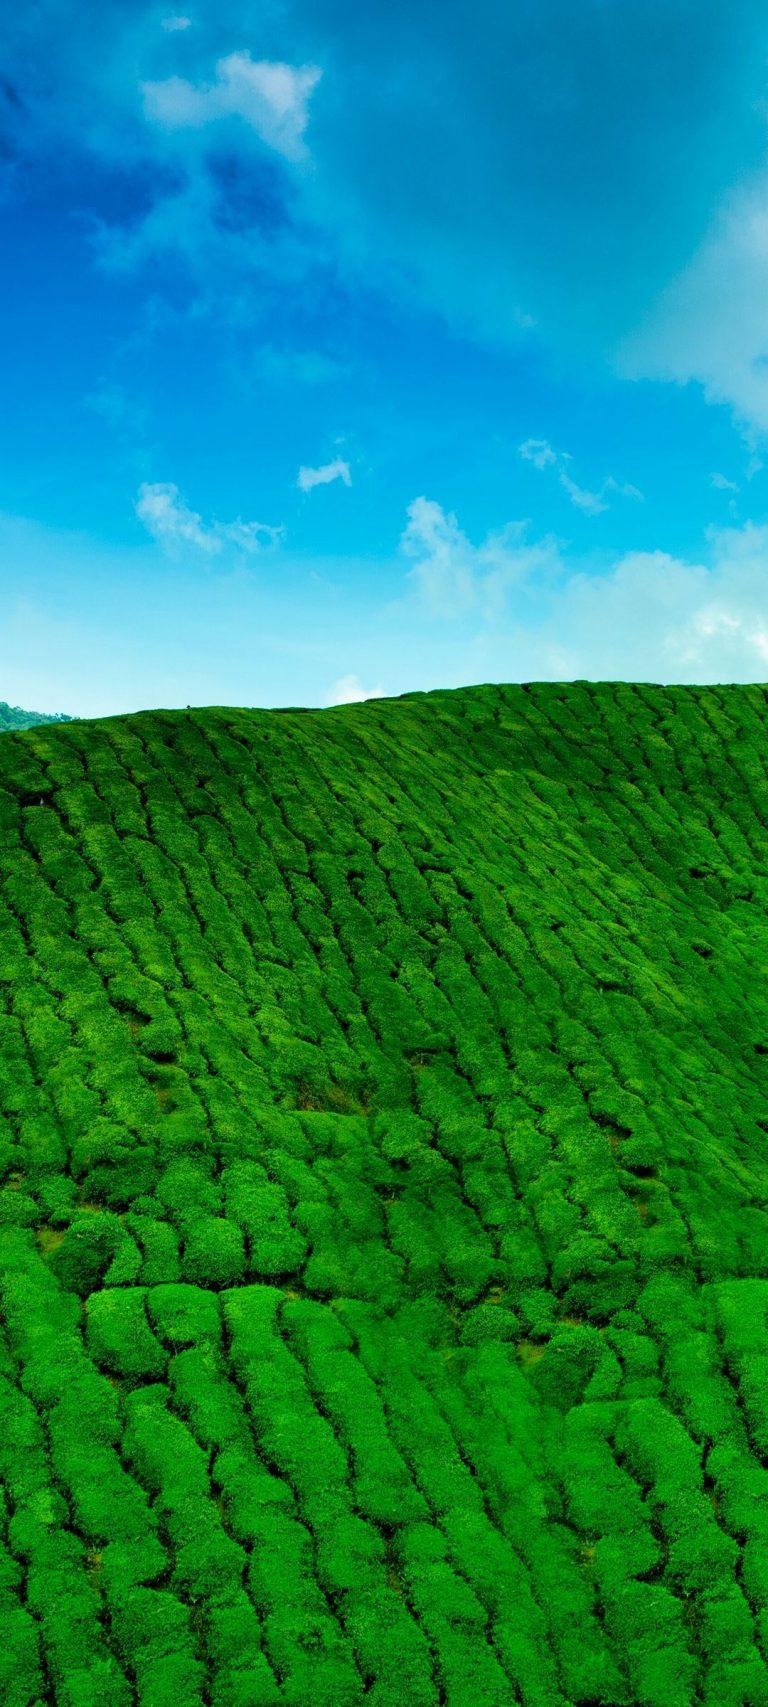 Mountains Tea Plantations Green 1080x2400 768x1707